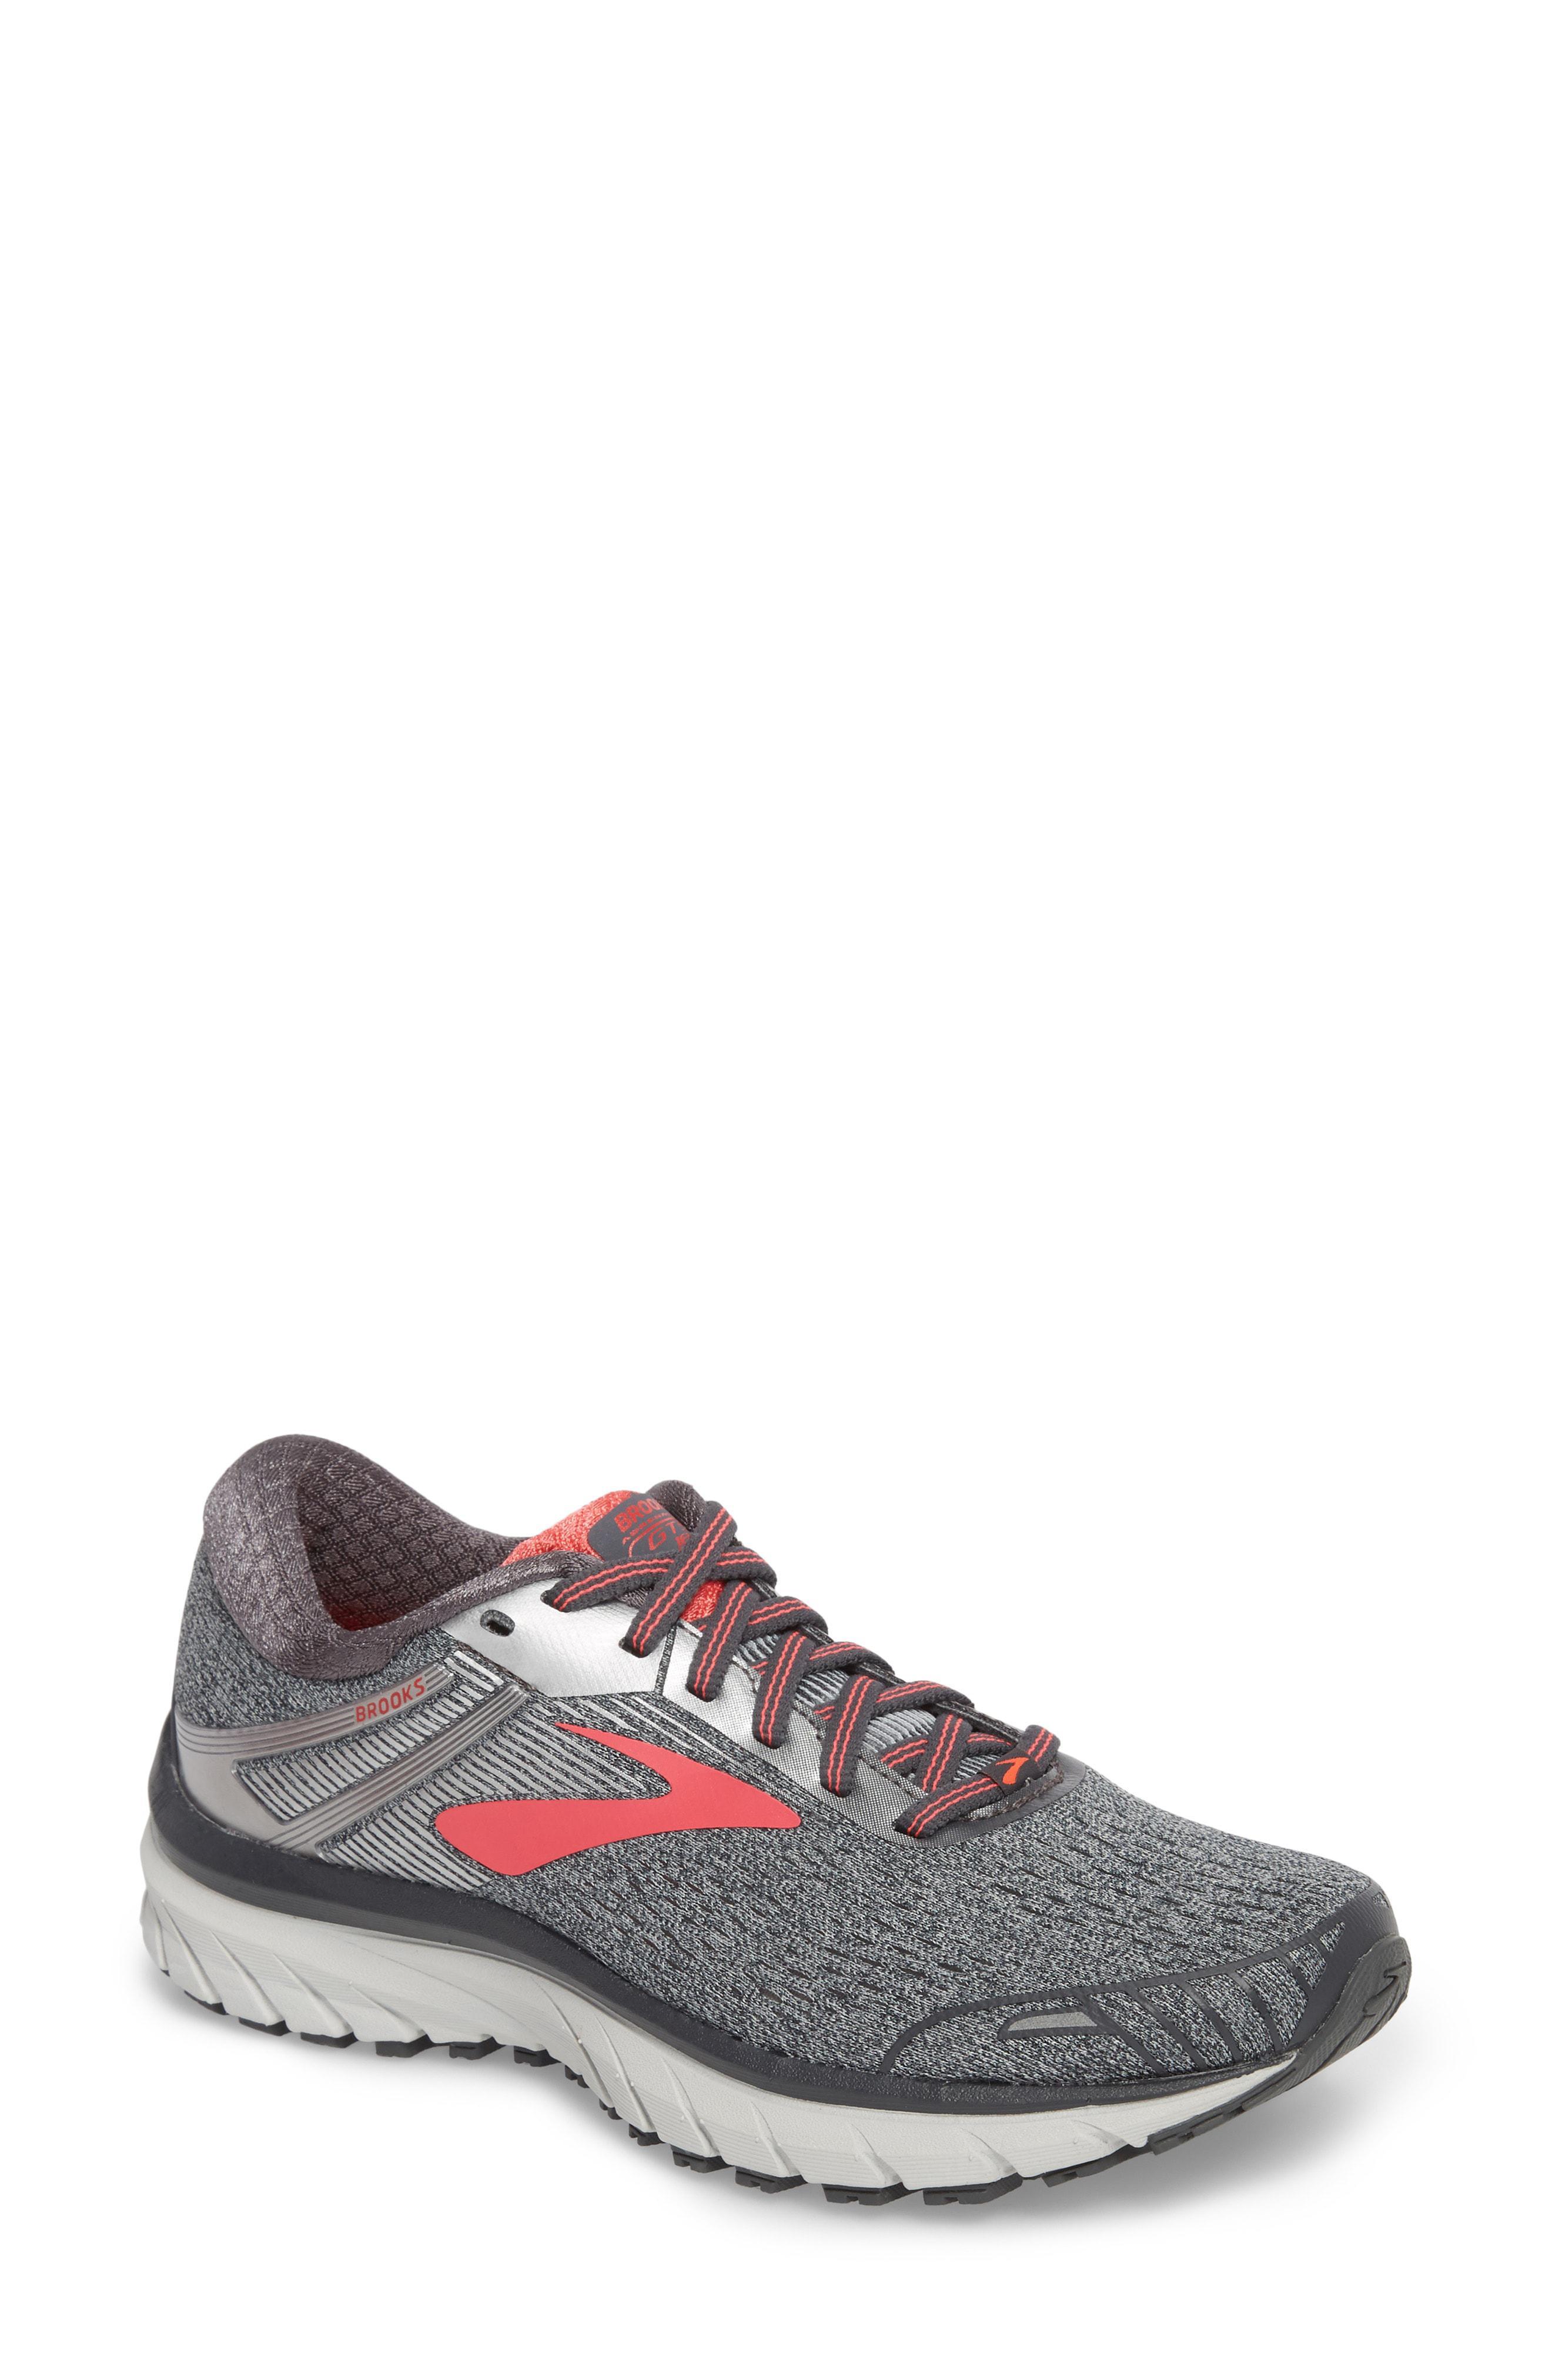 1f4c30629d95 Lyst - Brooks Adrenaline Gts 18 Running Shoe in Gray